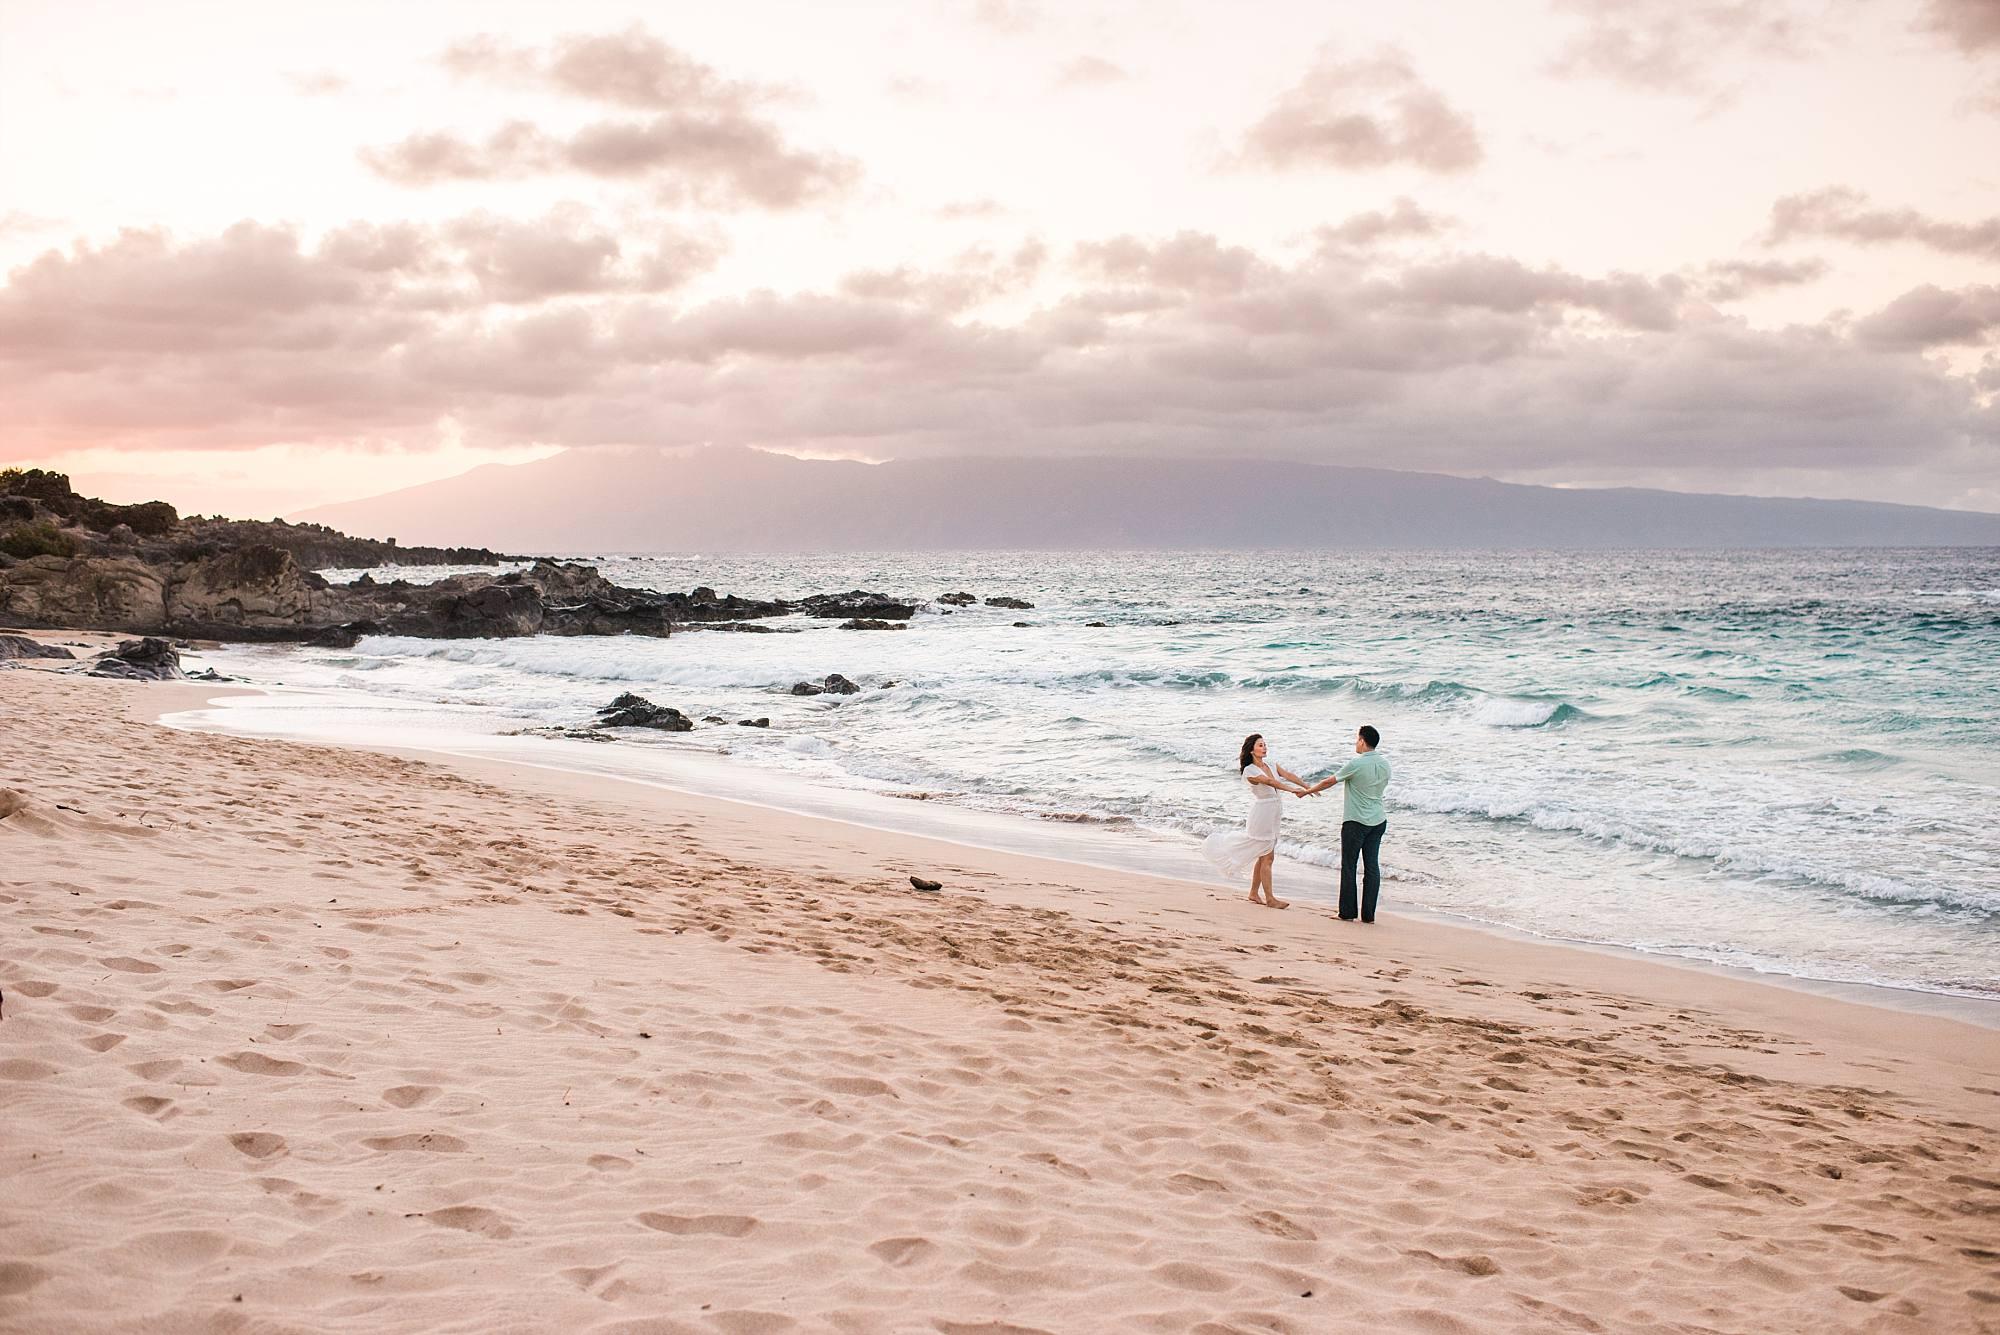 beach maternity shot of couple dancing on the beach